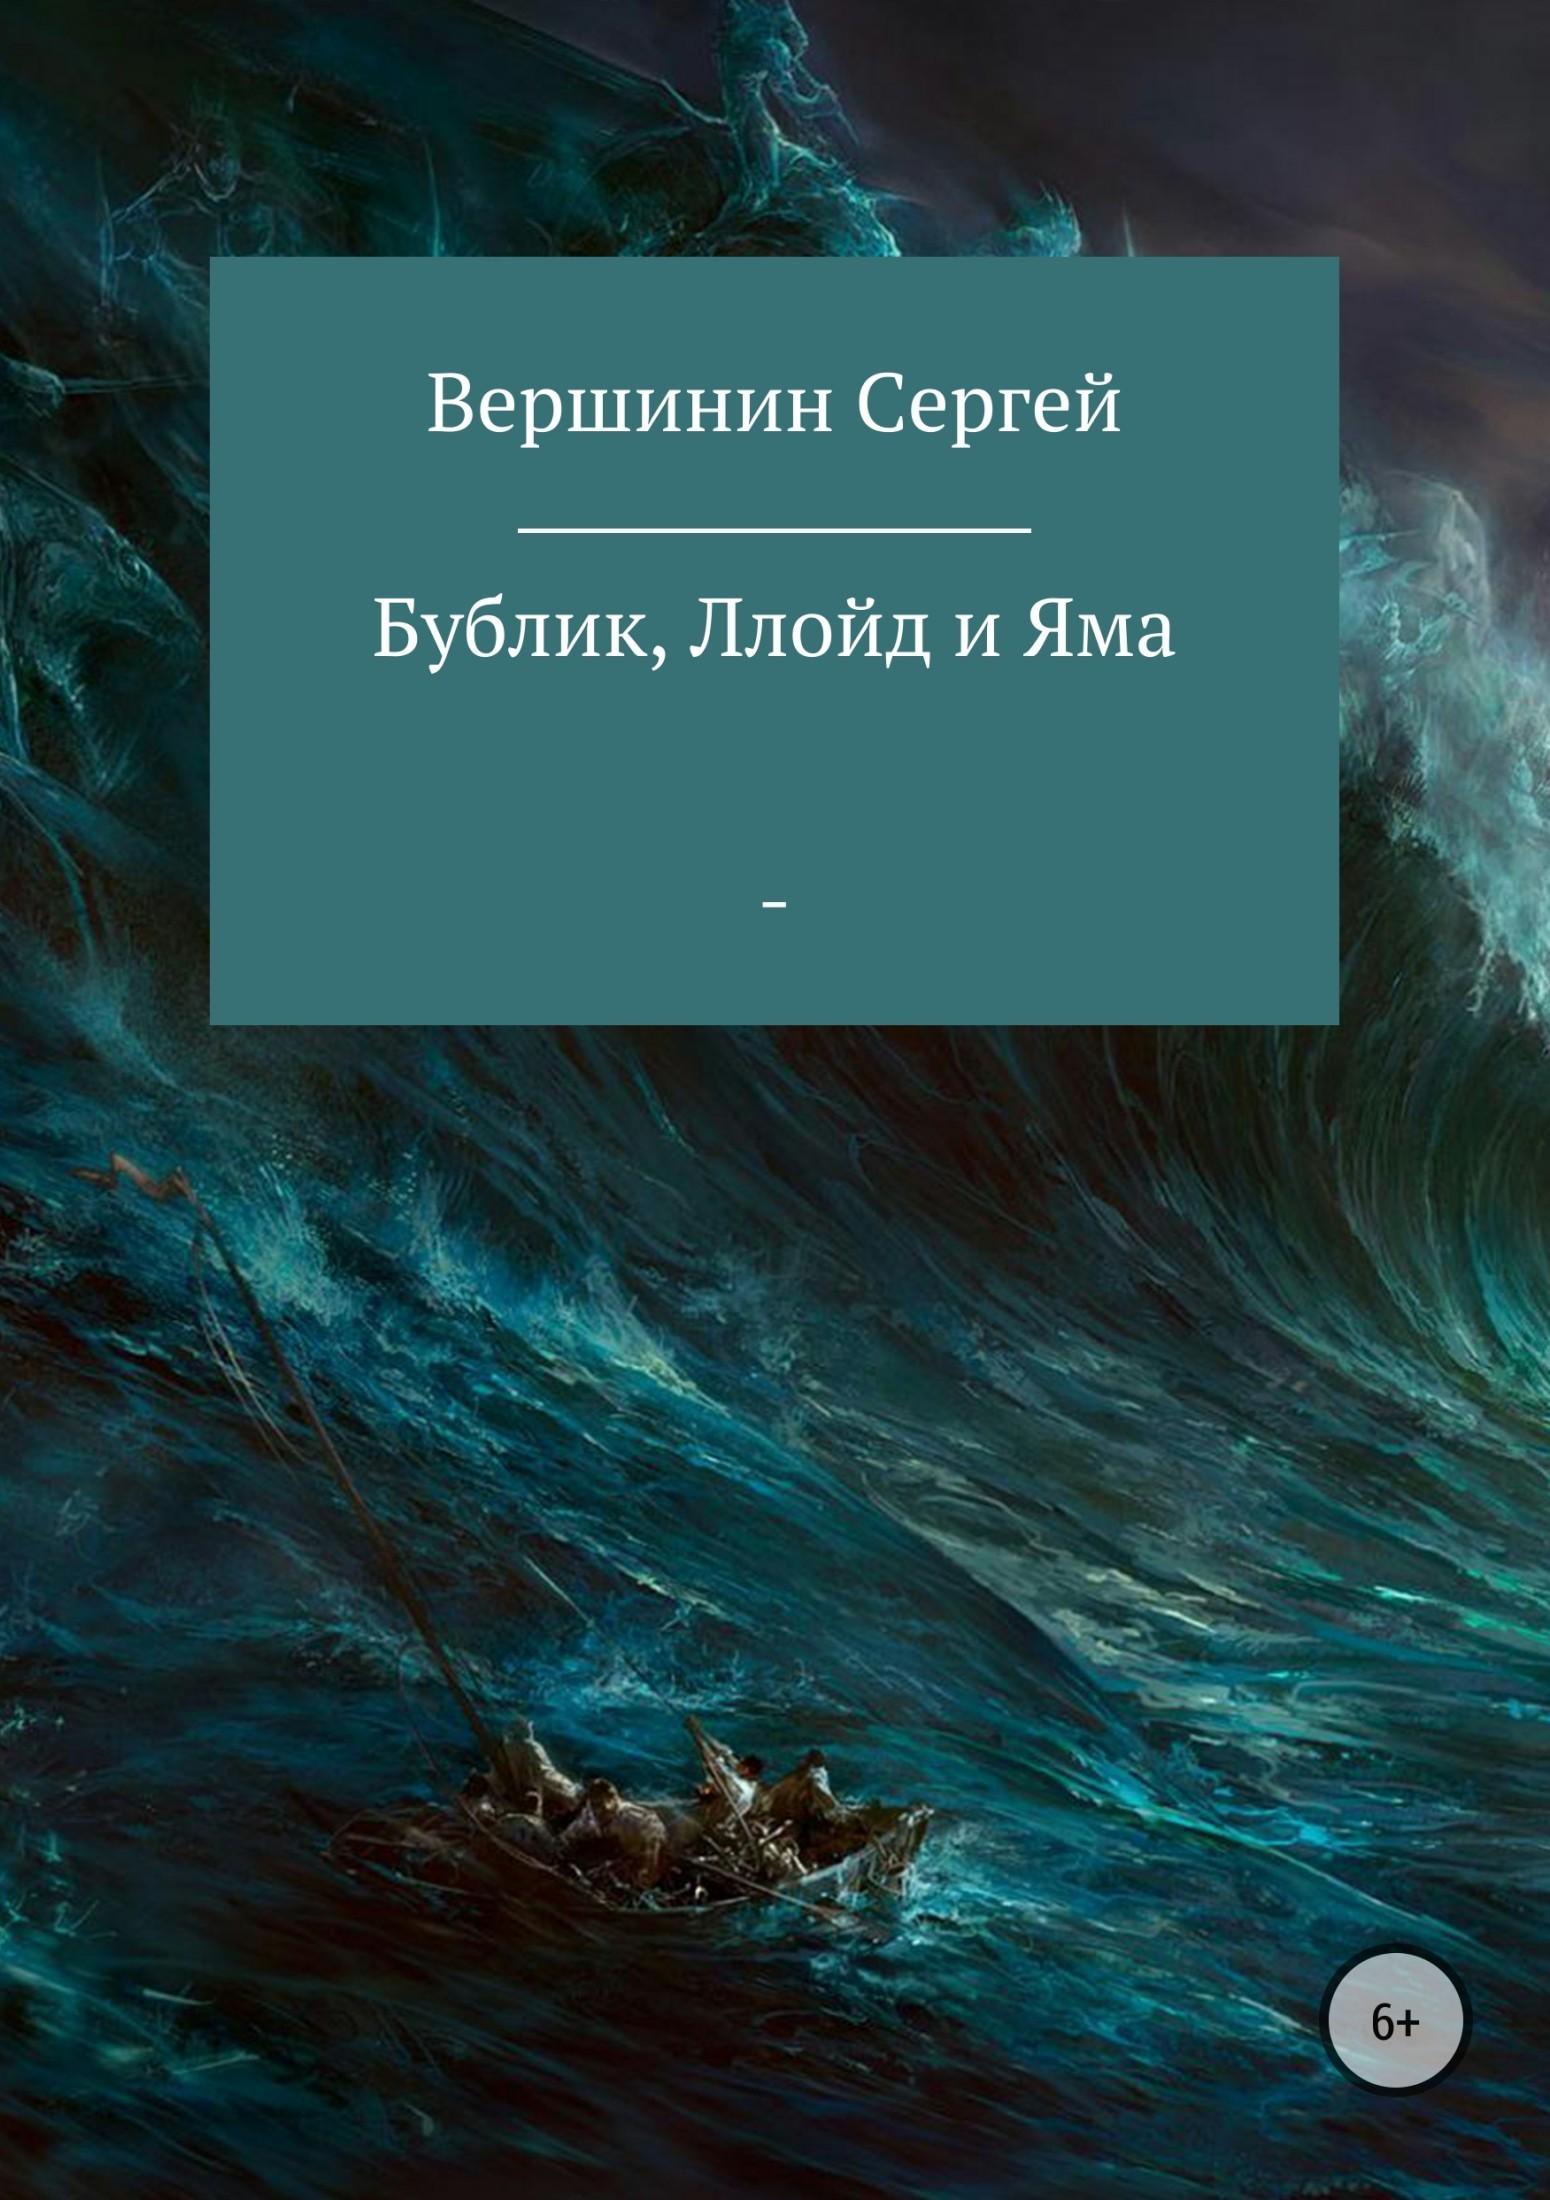 Сергей Вершинин Бублик, Ллойд и Яма